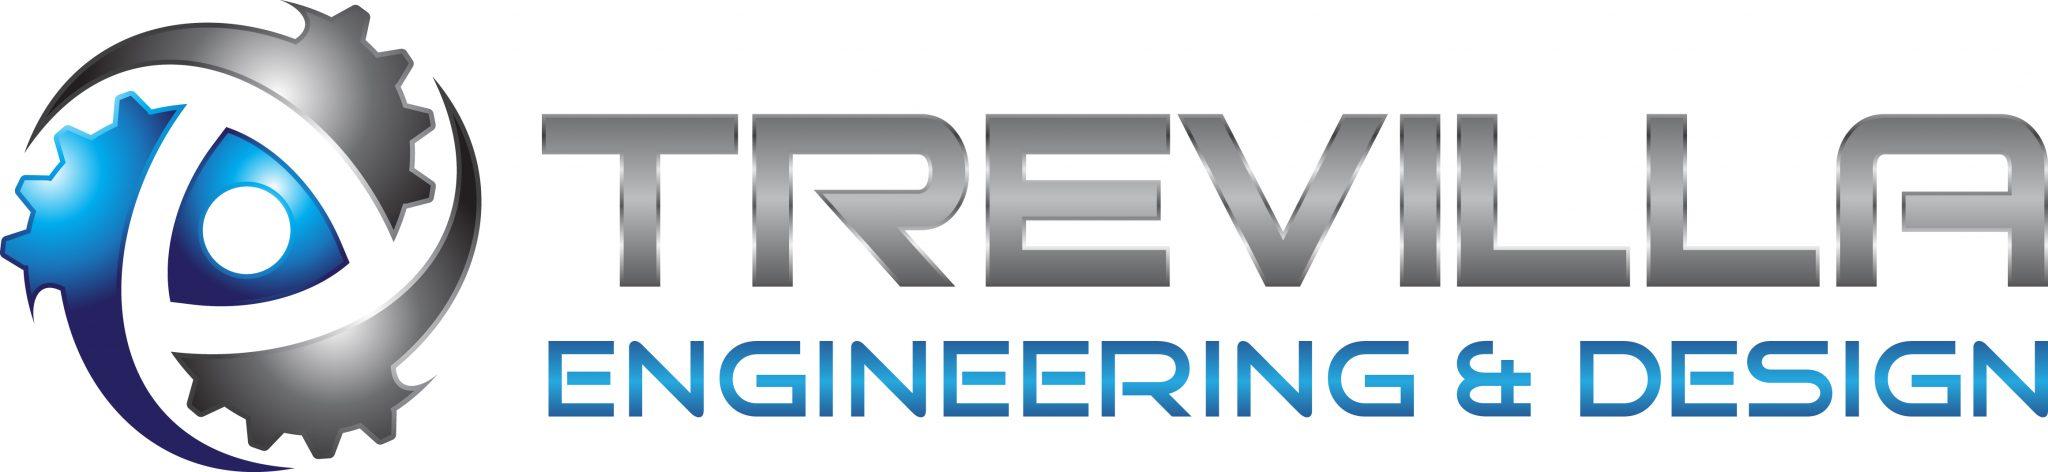 Trevilla Engineering and Design